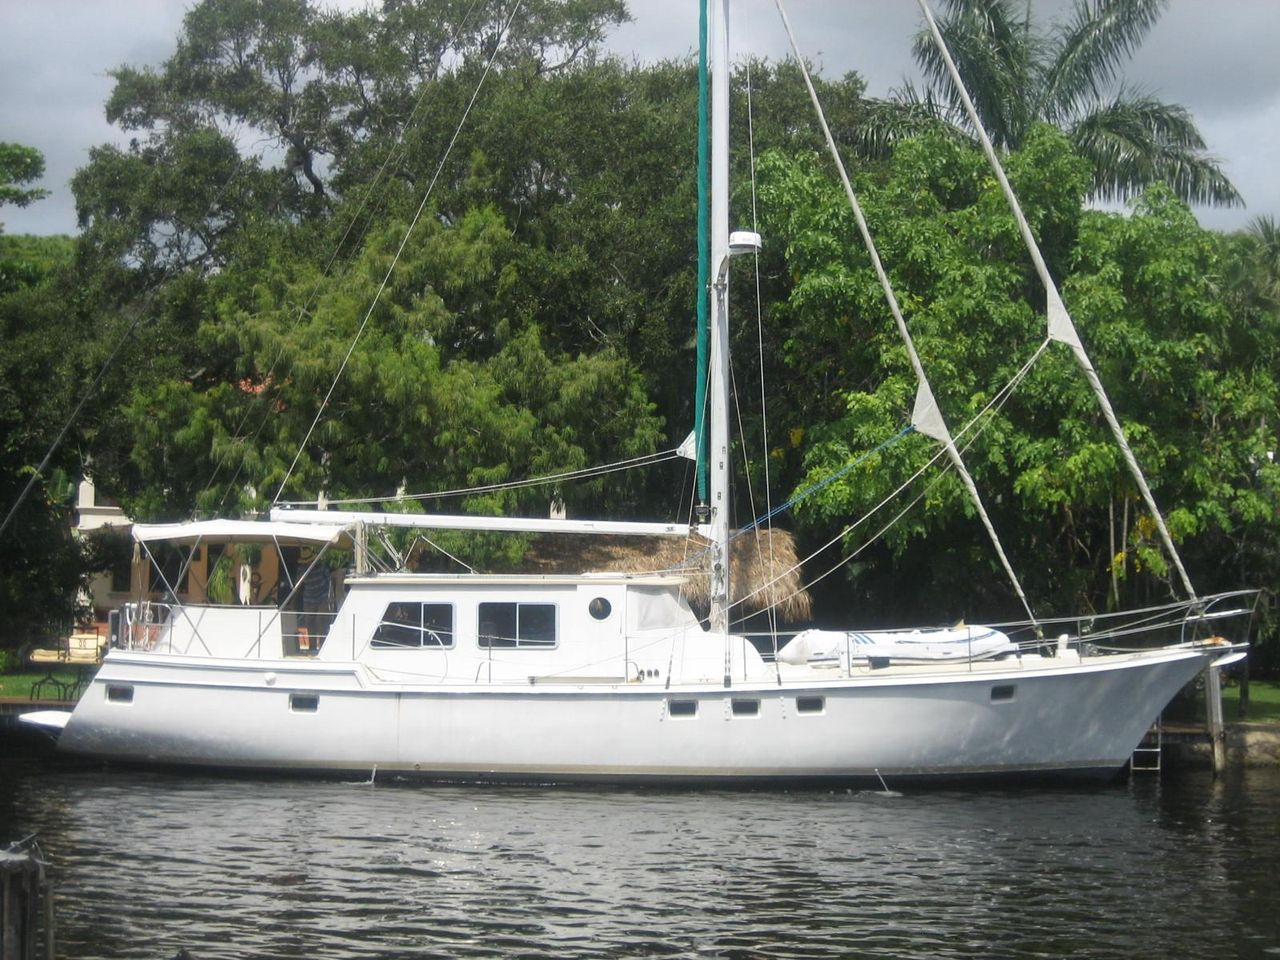 1989 Used Wellington Pilothouse Sailboat For Sale 300 000